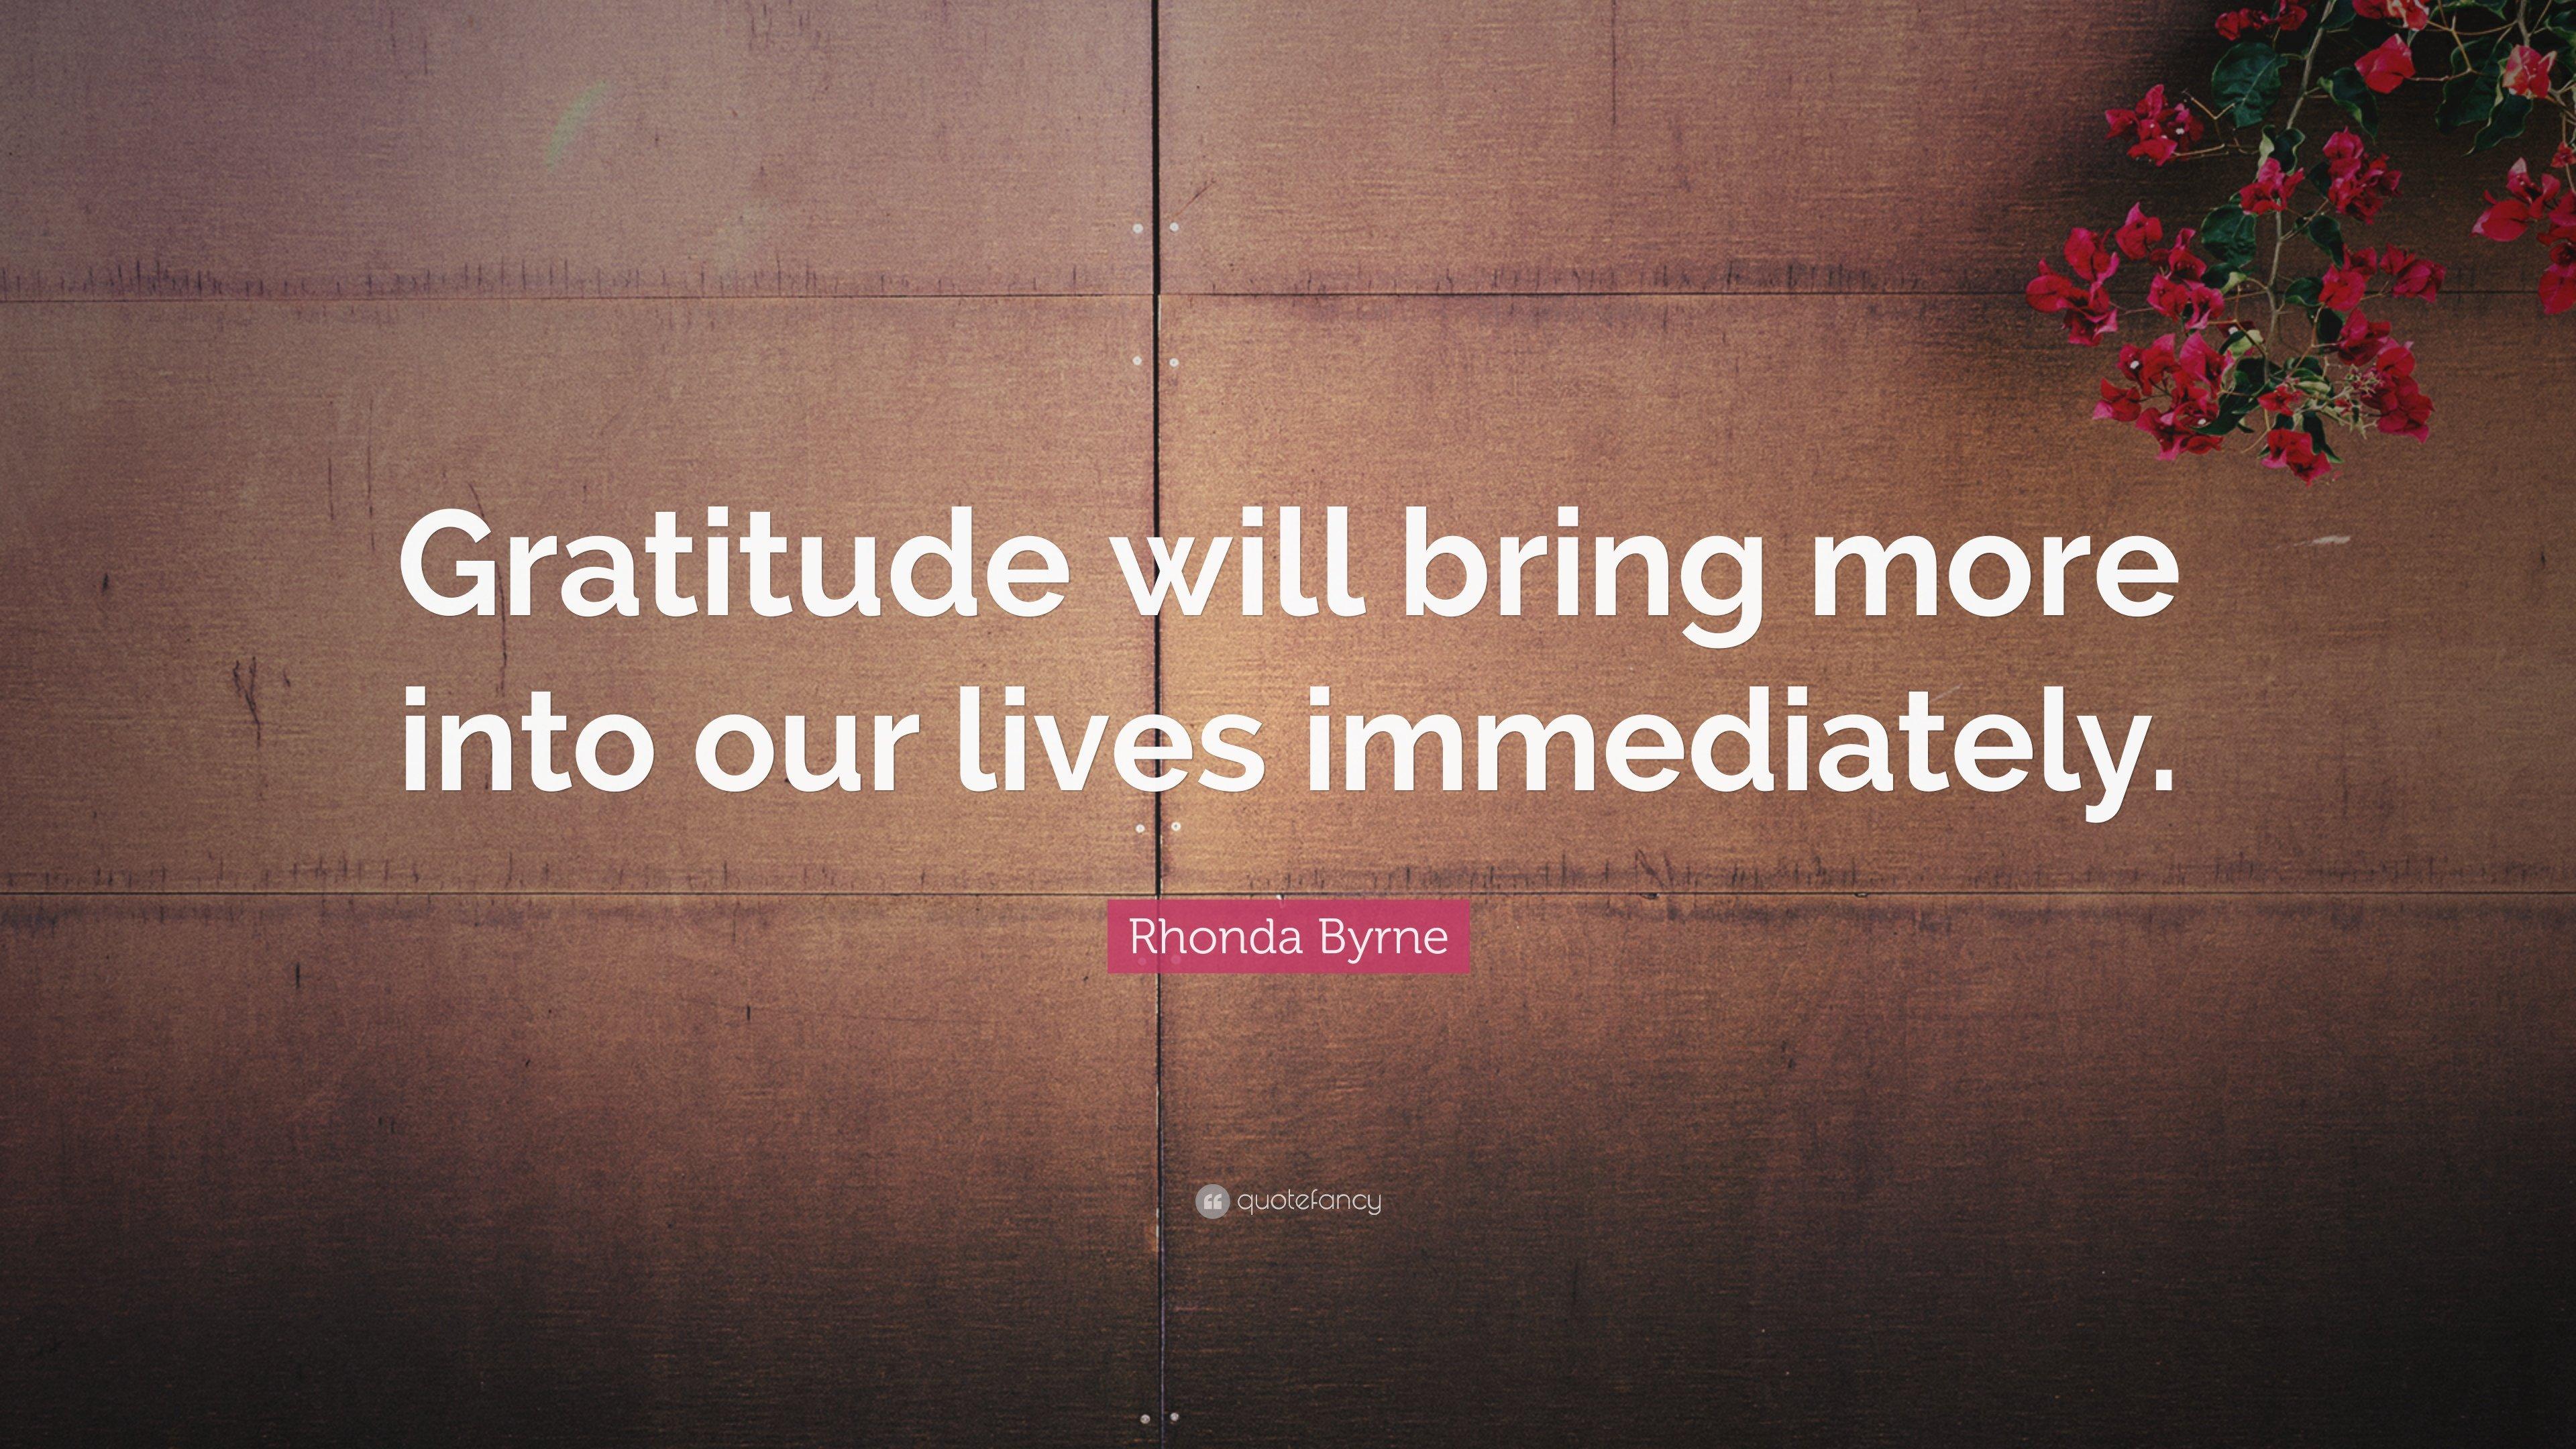 wednesday wallpaper gratitude brings - photo #34